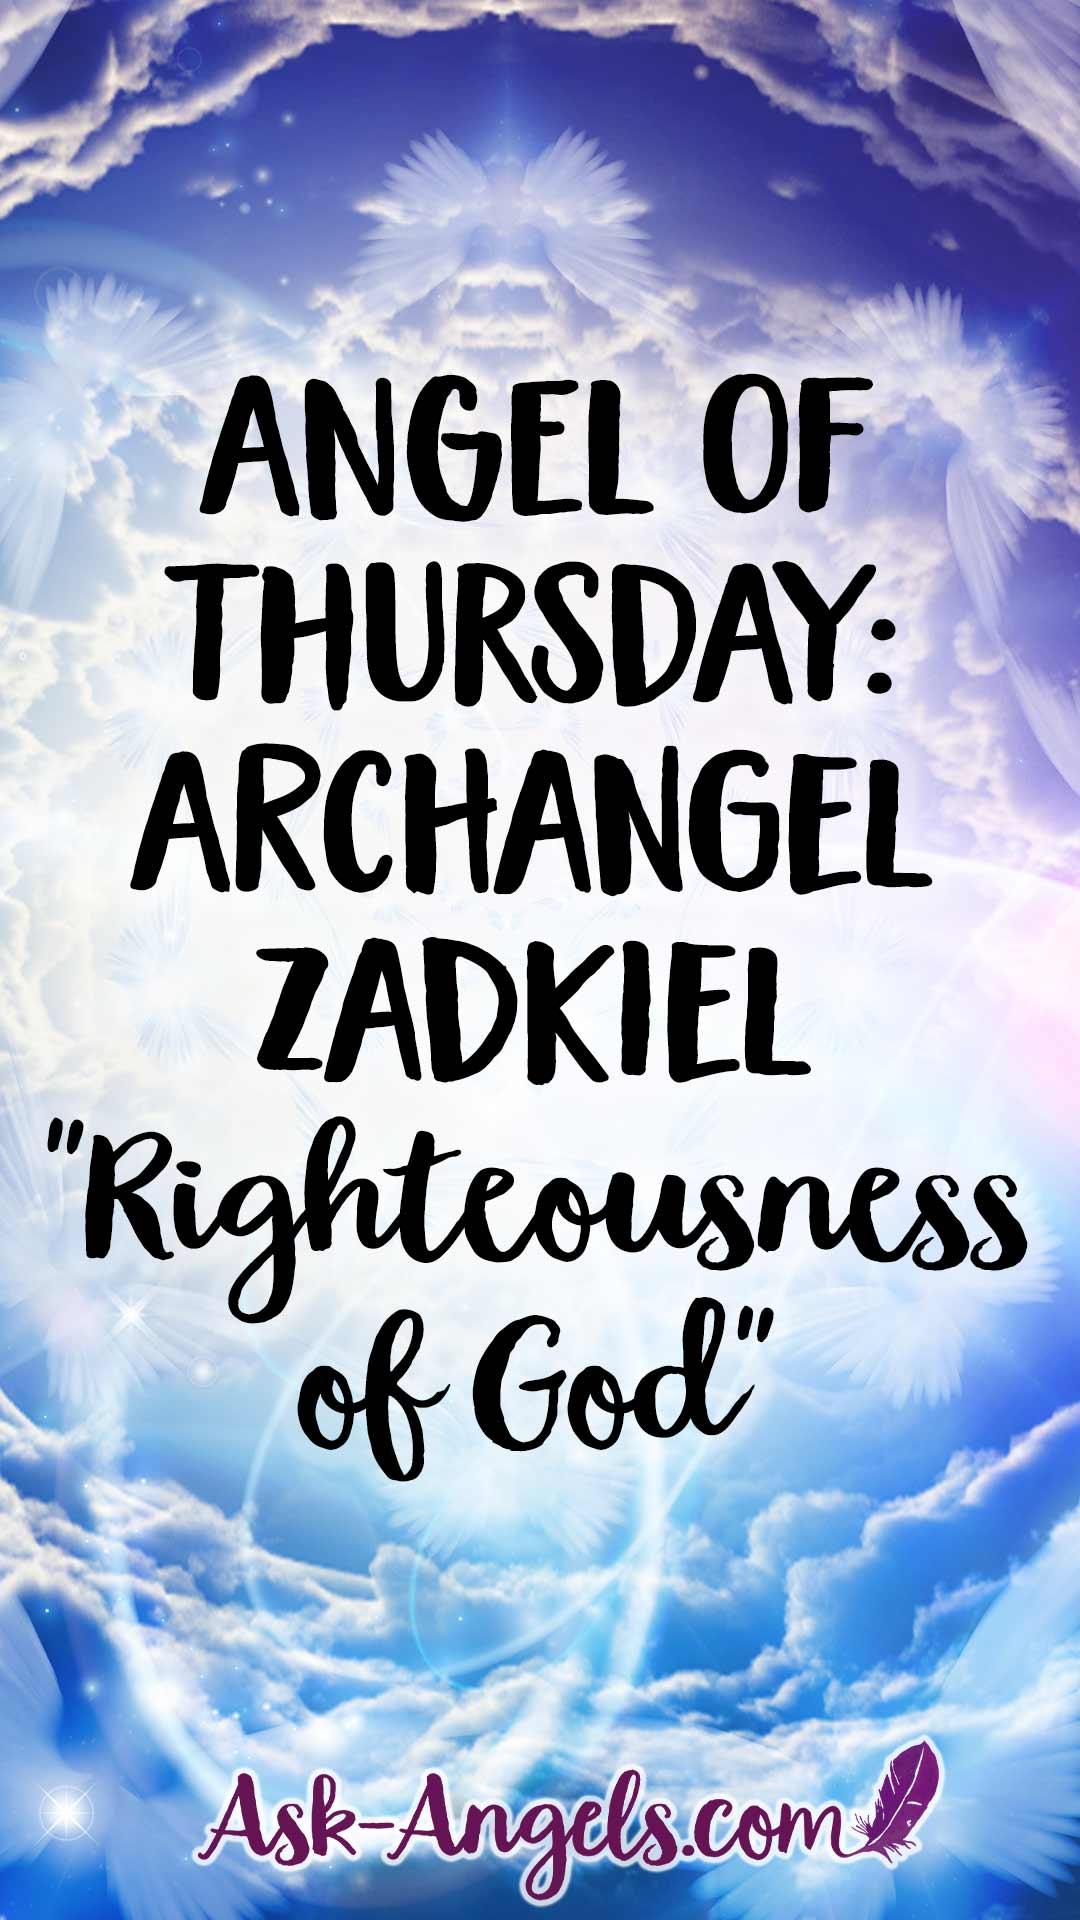 Angel of Thursday: Archangel Zadkiel - Righteousness of God